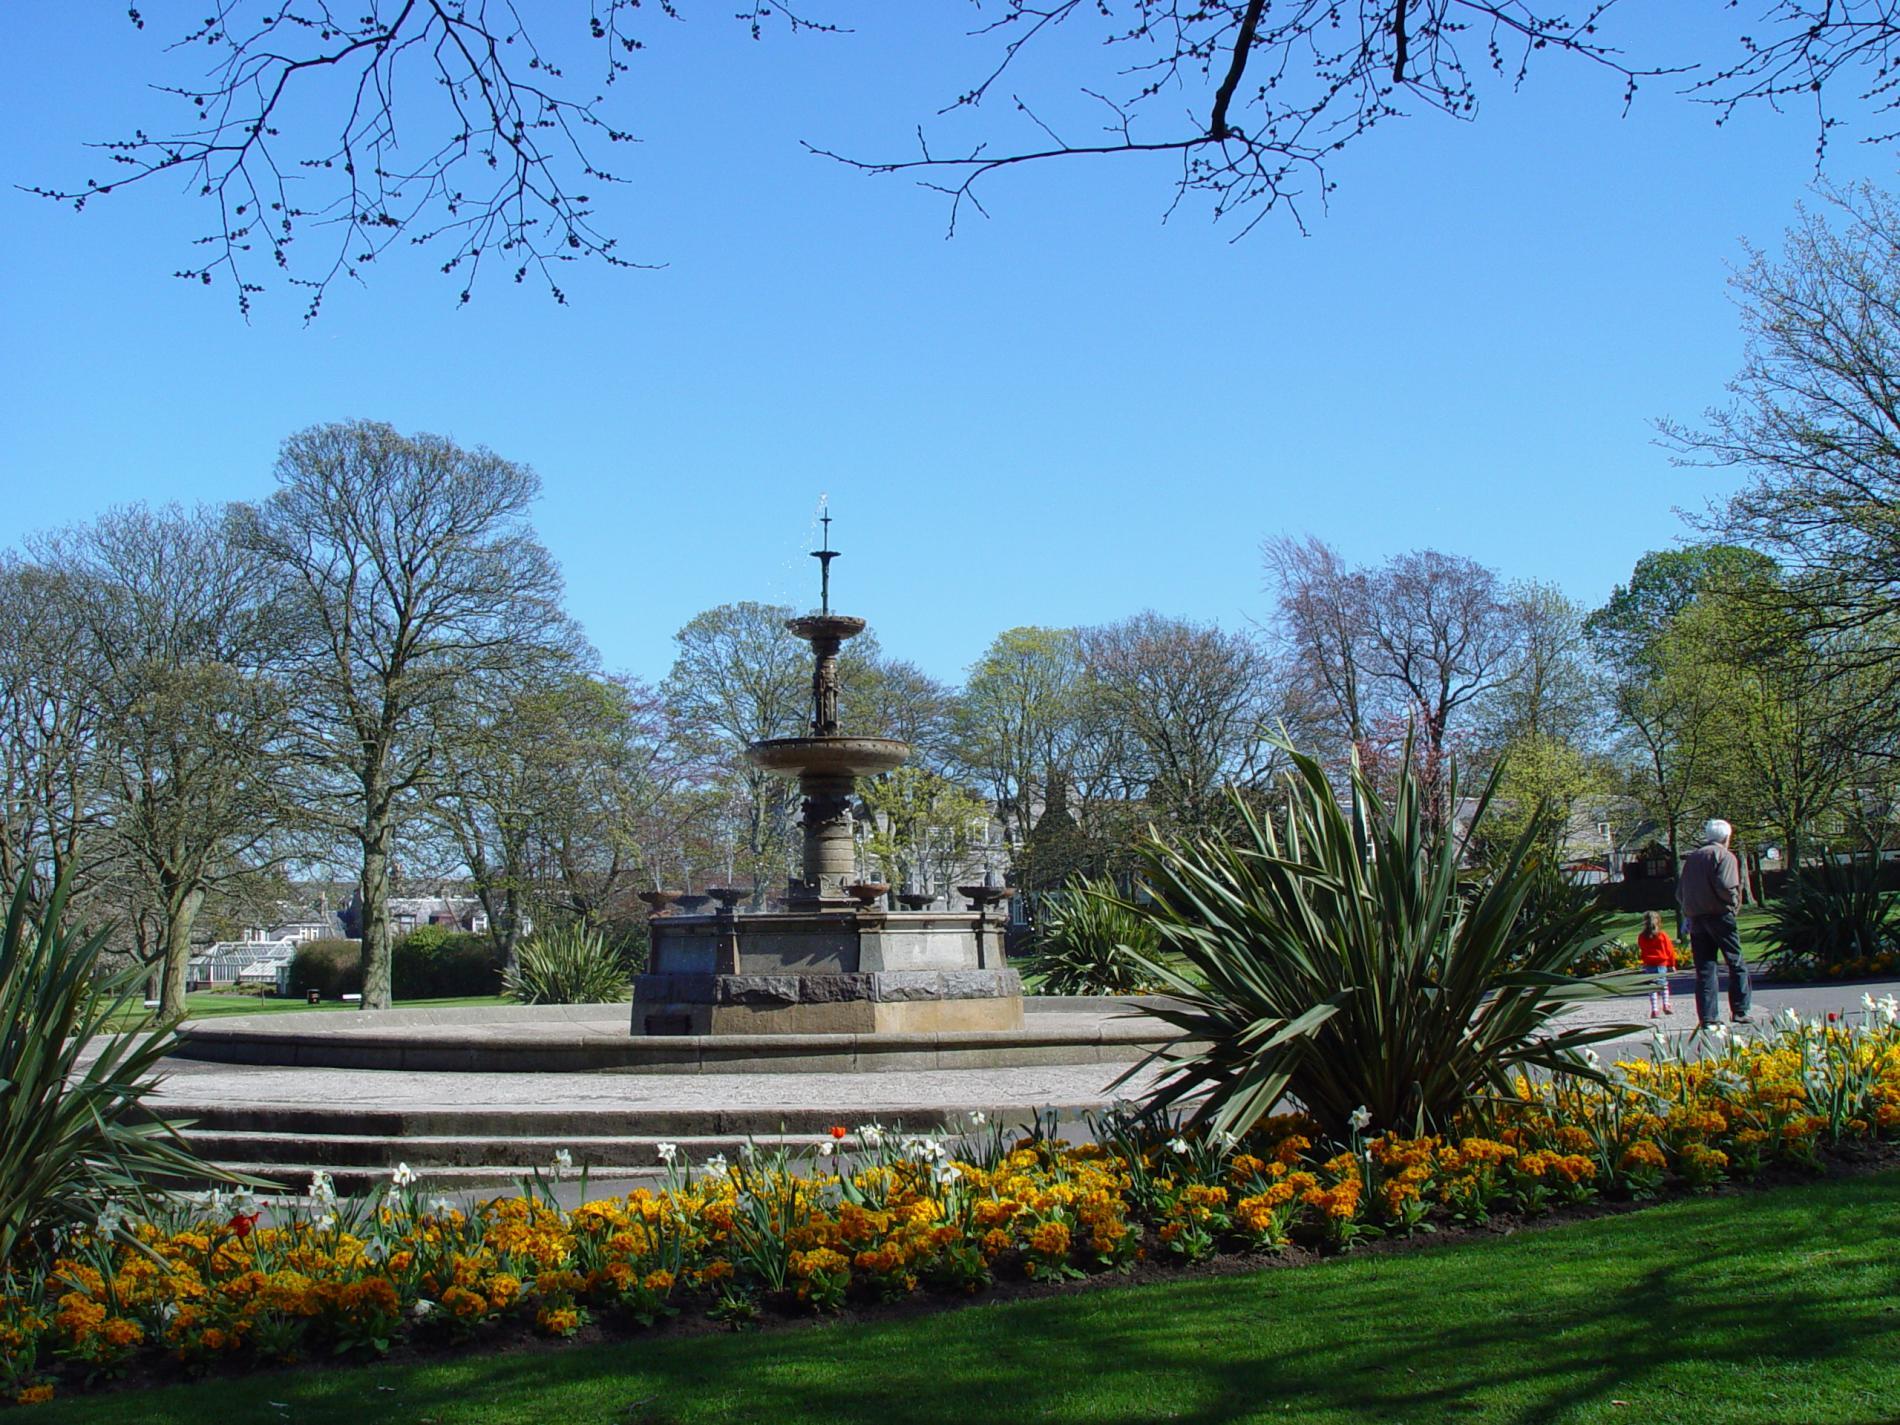 Quarry Shade Garden At Bon Air Park: Victoria Park In Aberdeen With Sensory Garden